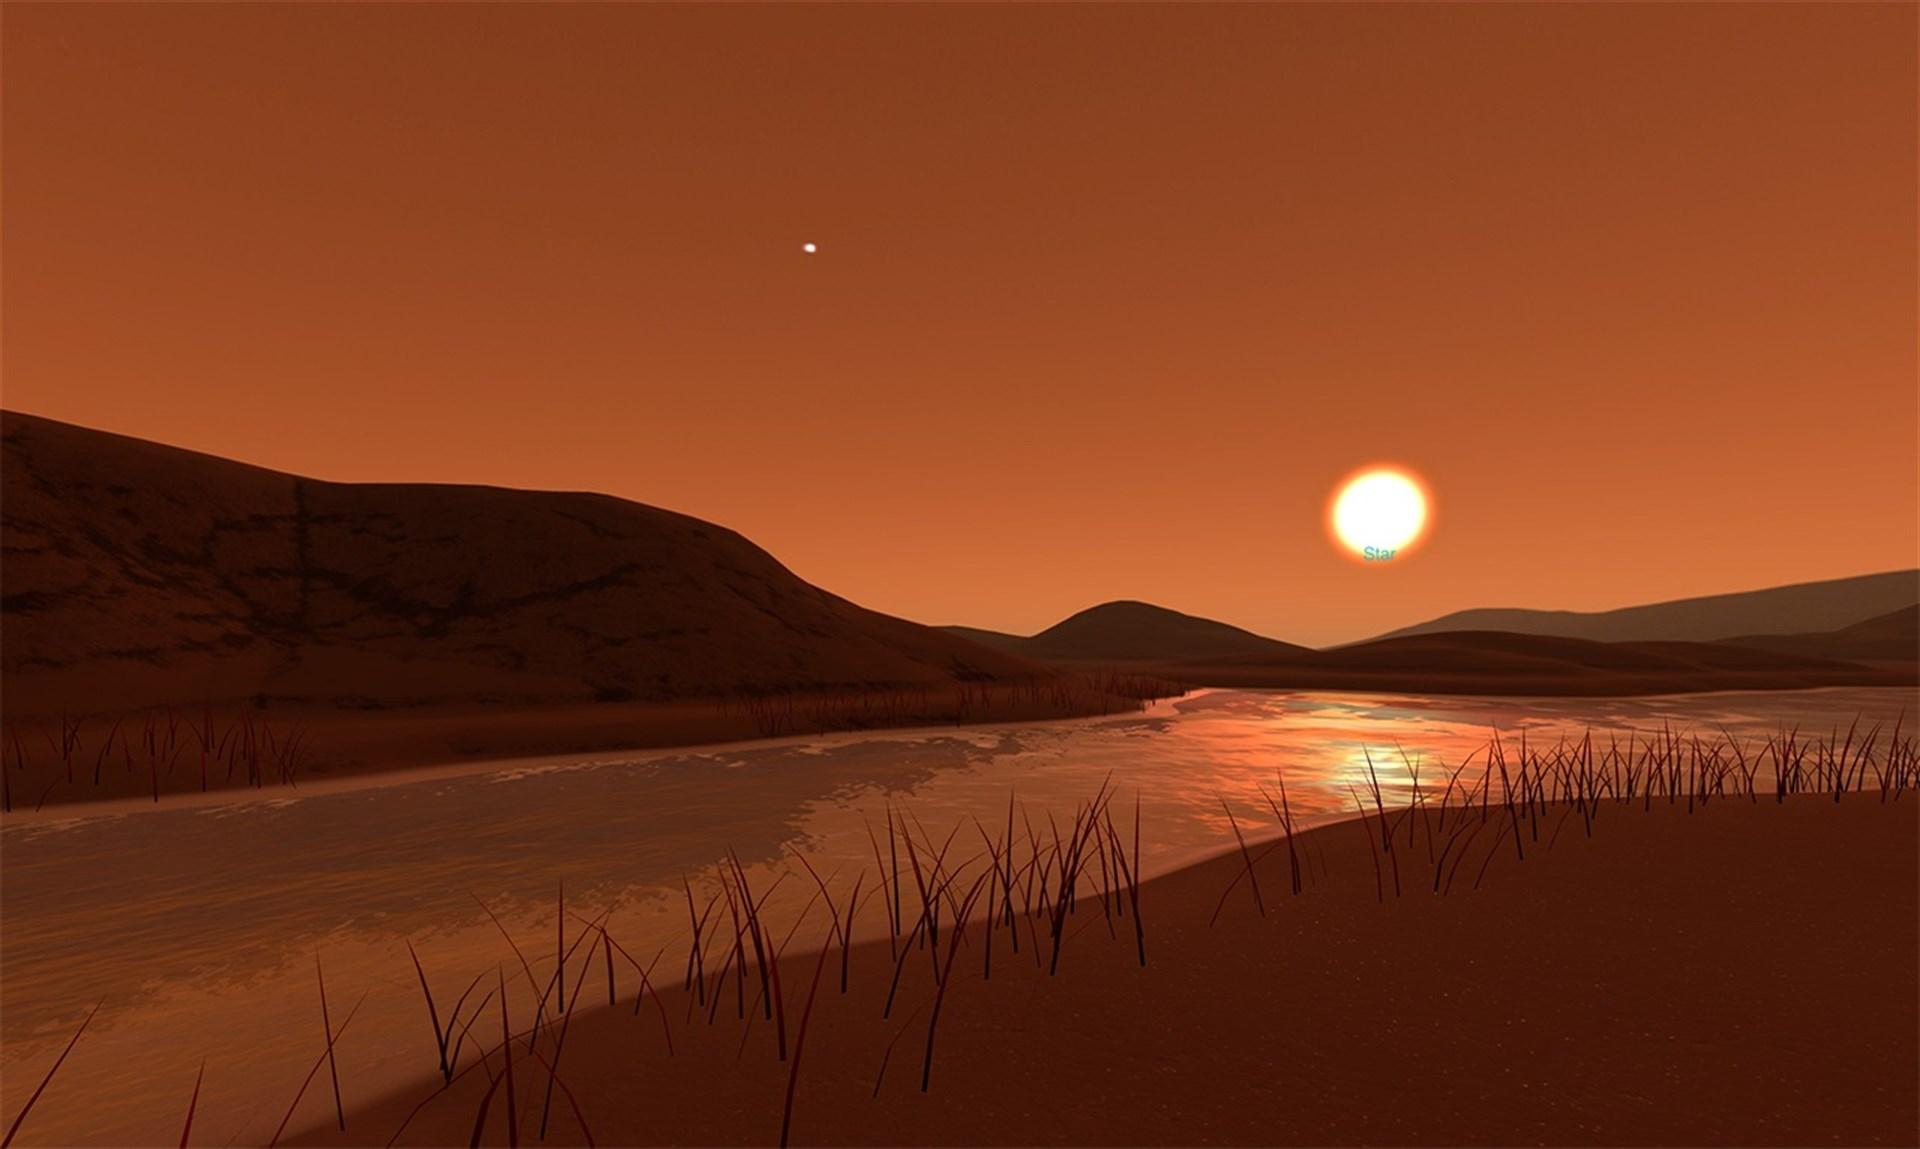 La NASA ofrece viaje virtual al paisaje supuesto de otros mundos